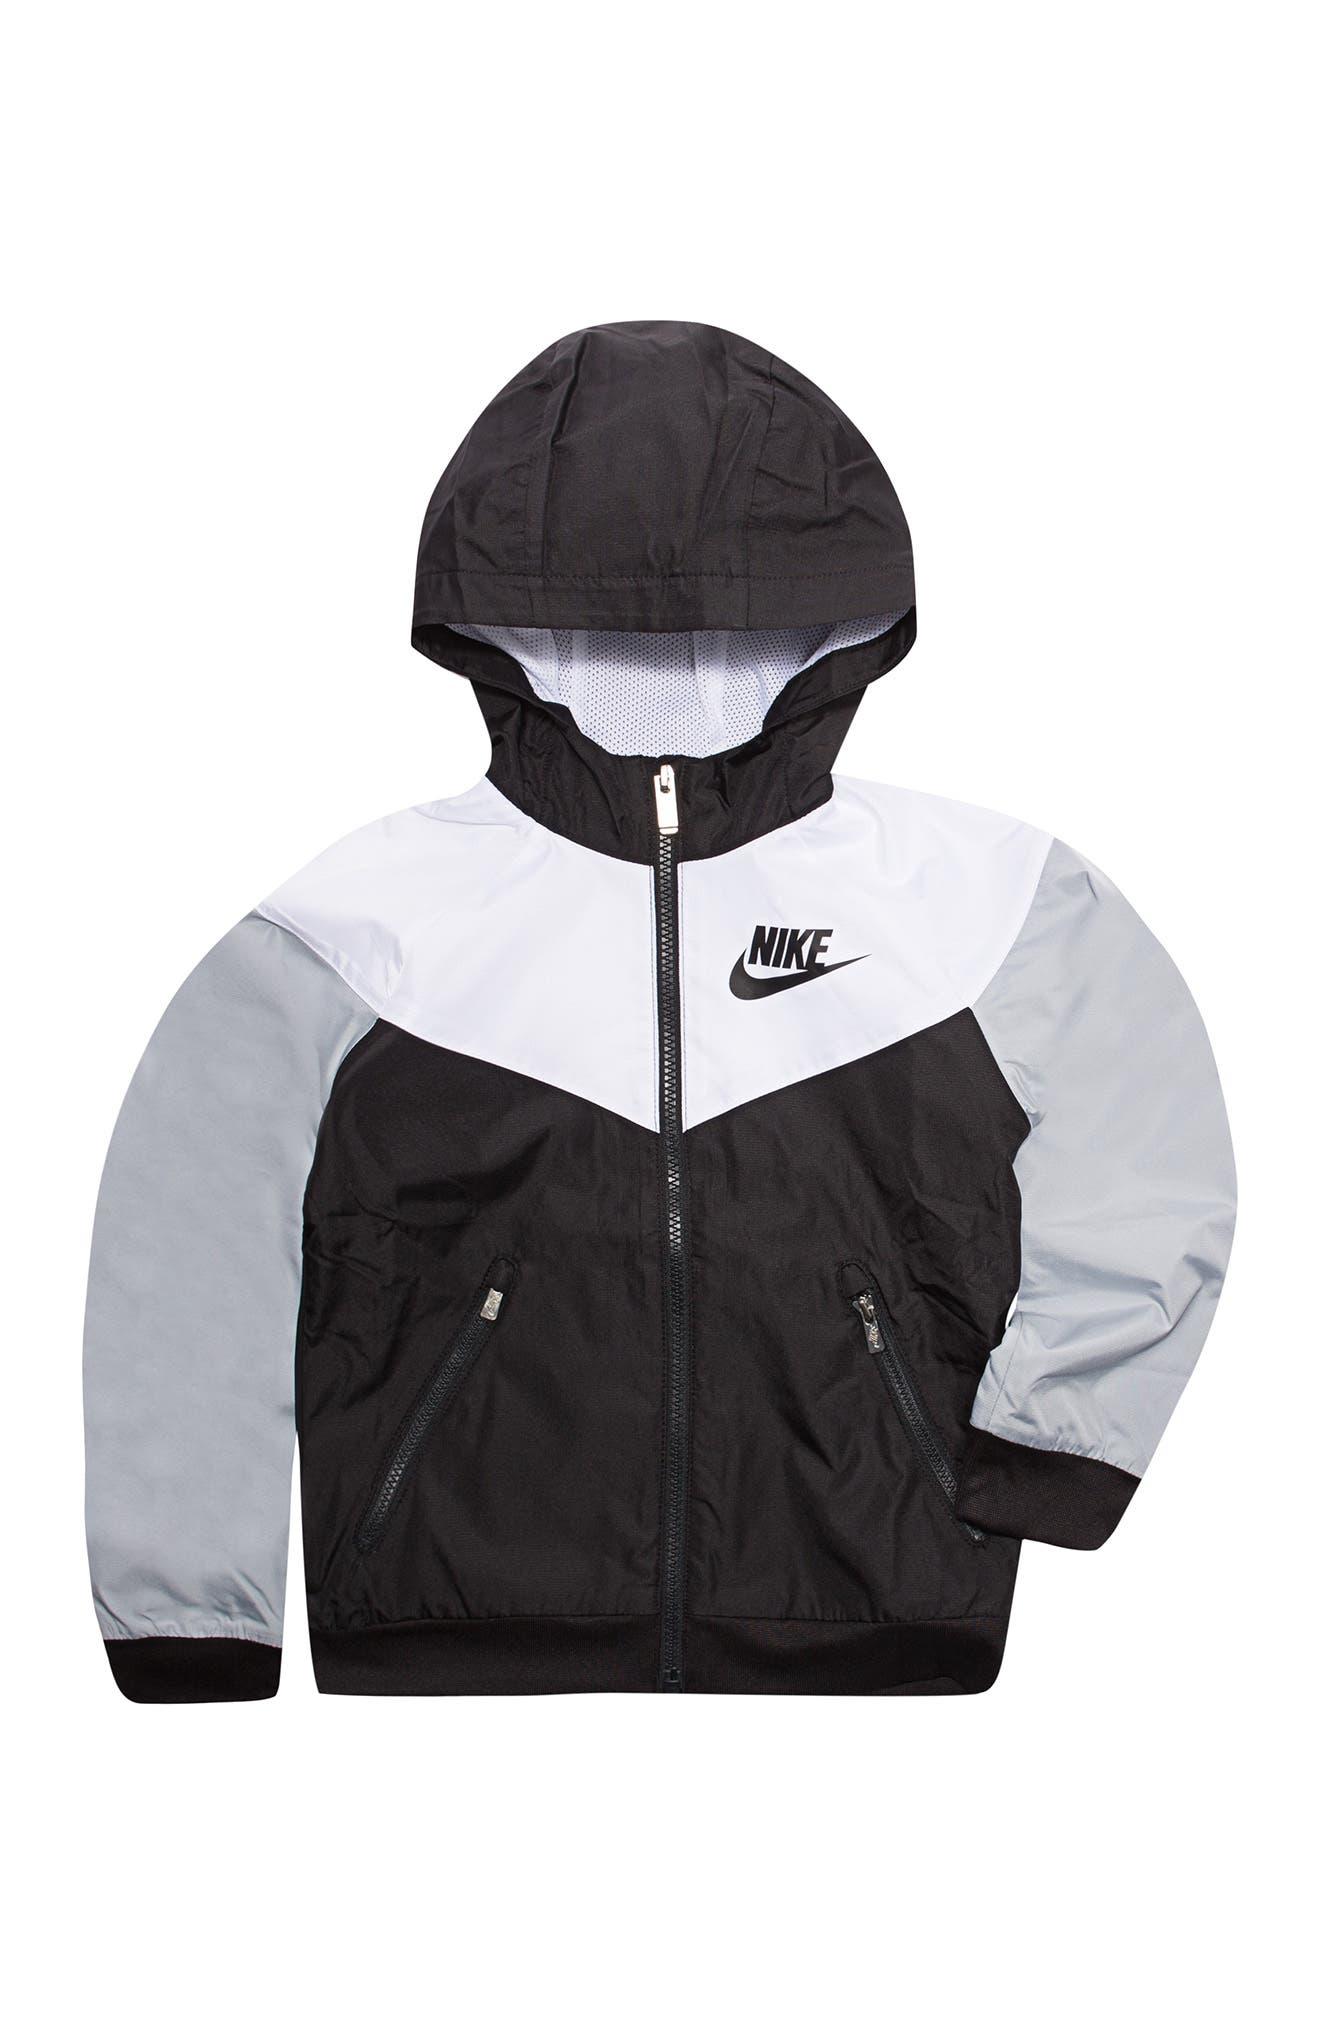 Image of Nike Windrunner Water Resistant Hooded Jacket